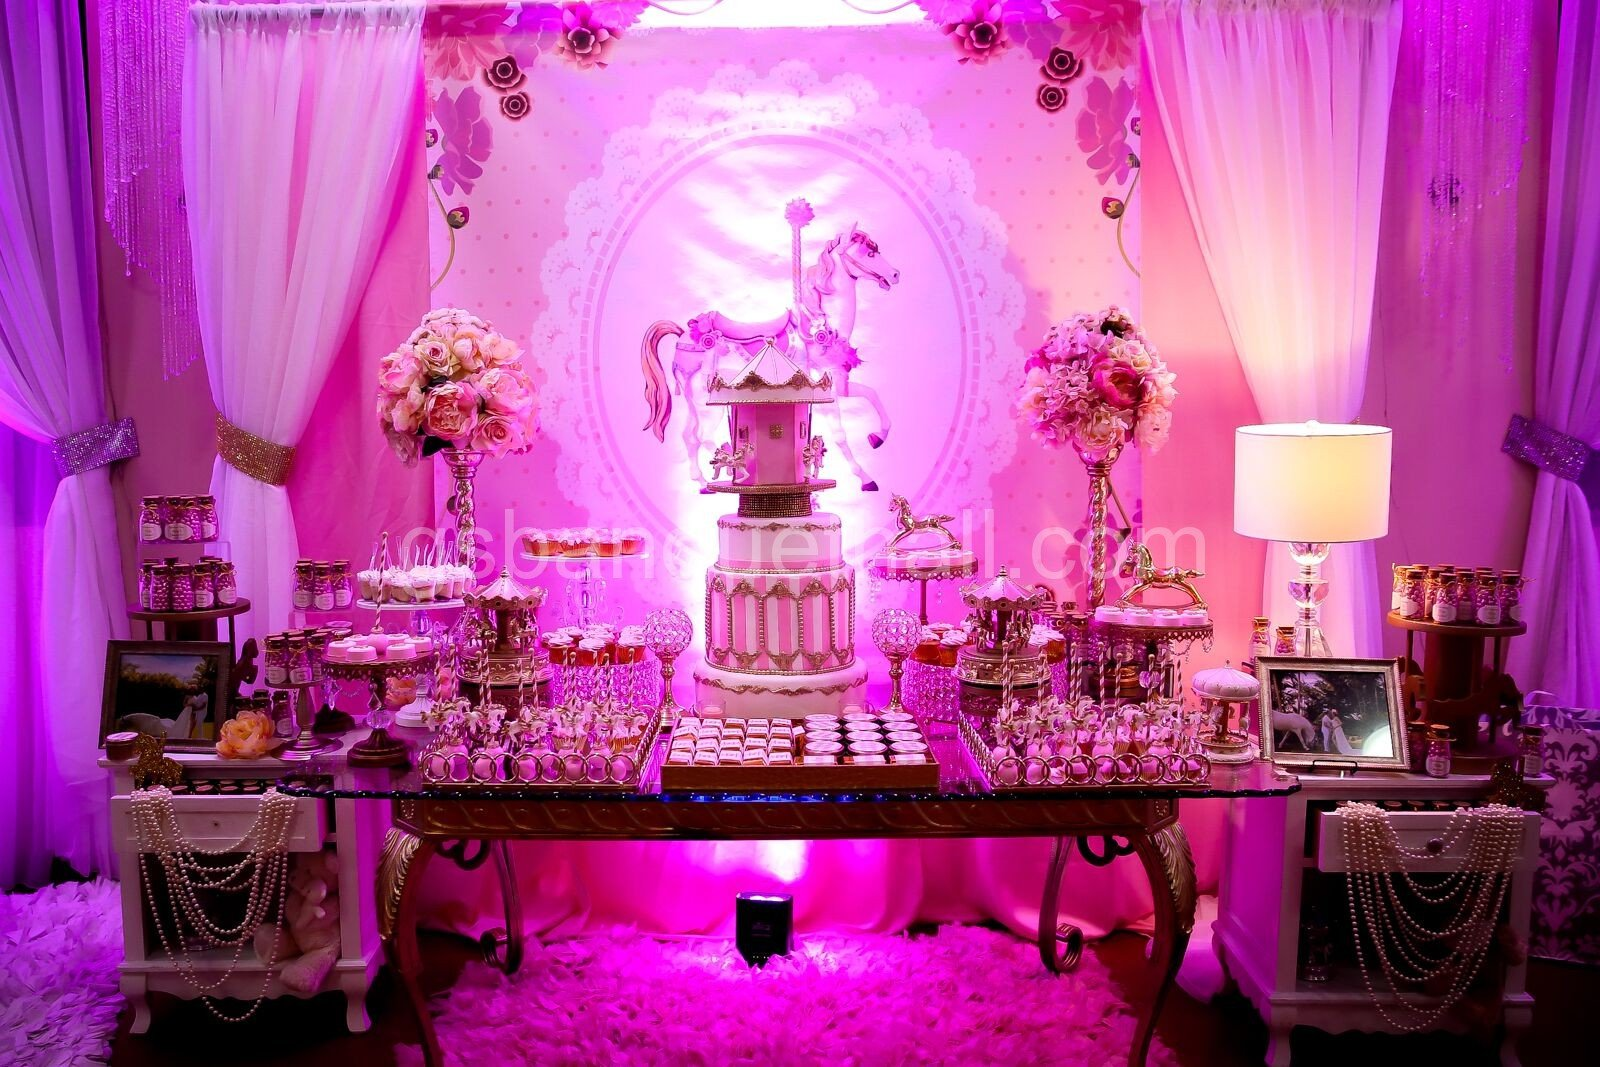 Carousel Baby Shower - Vintage event decoration.